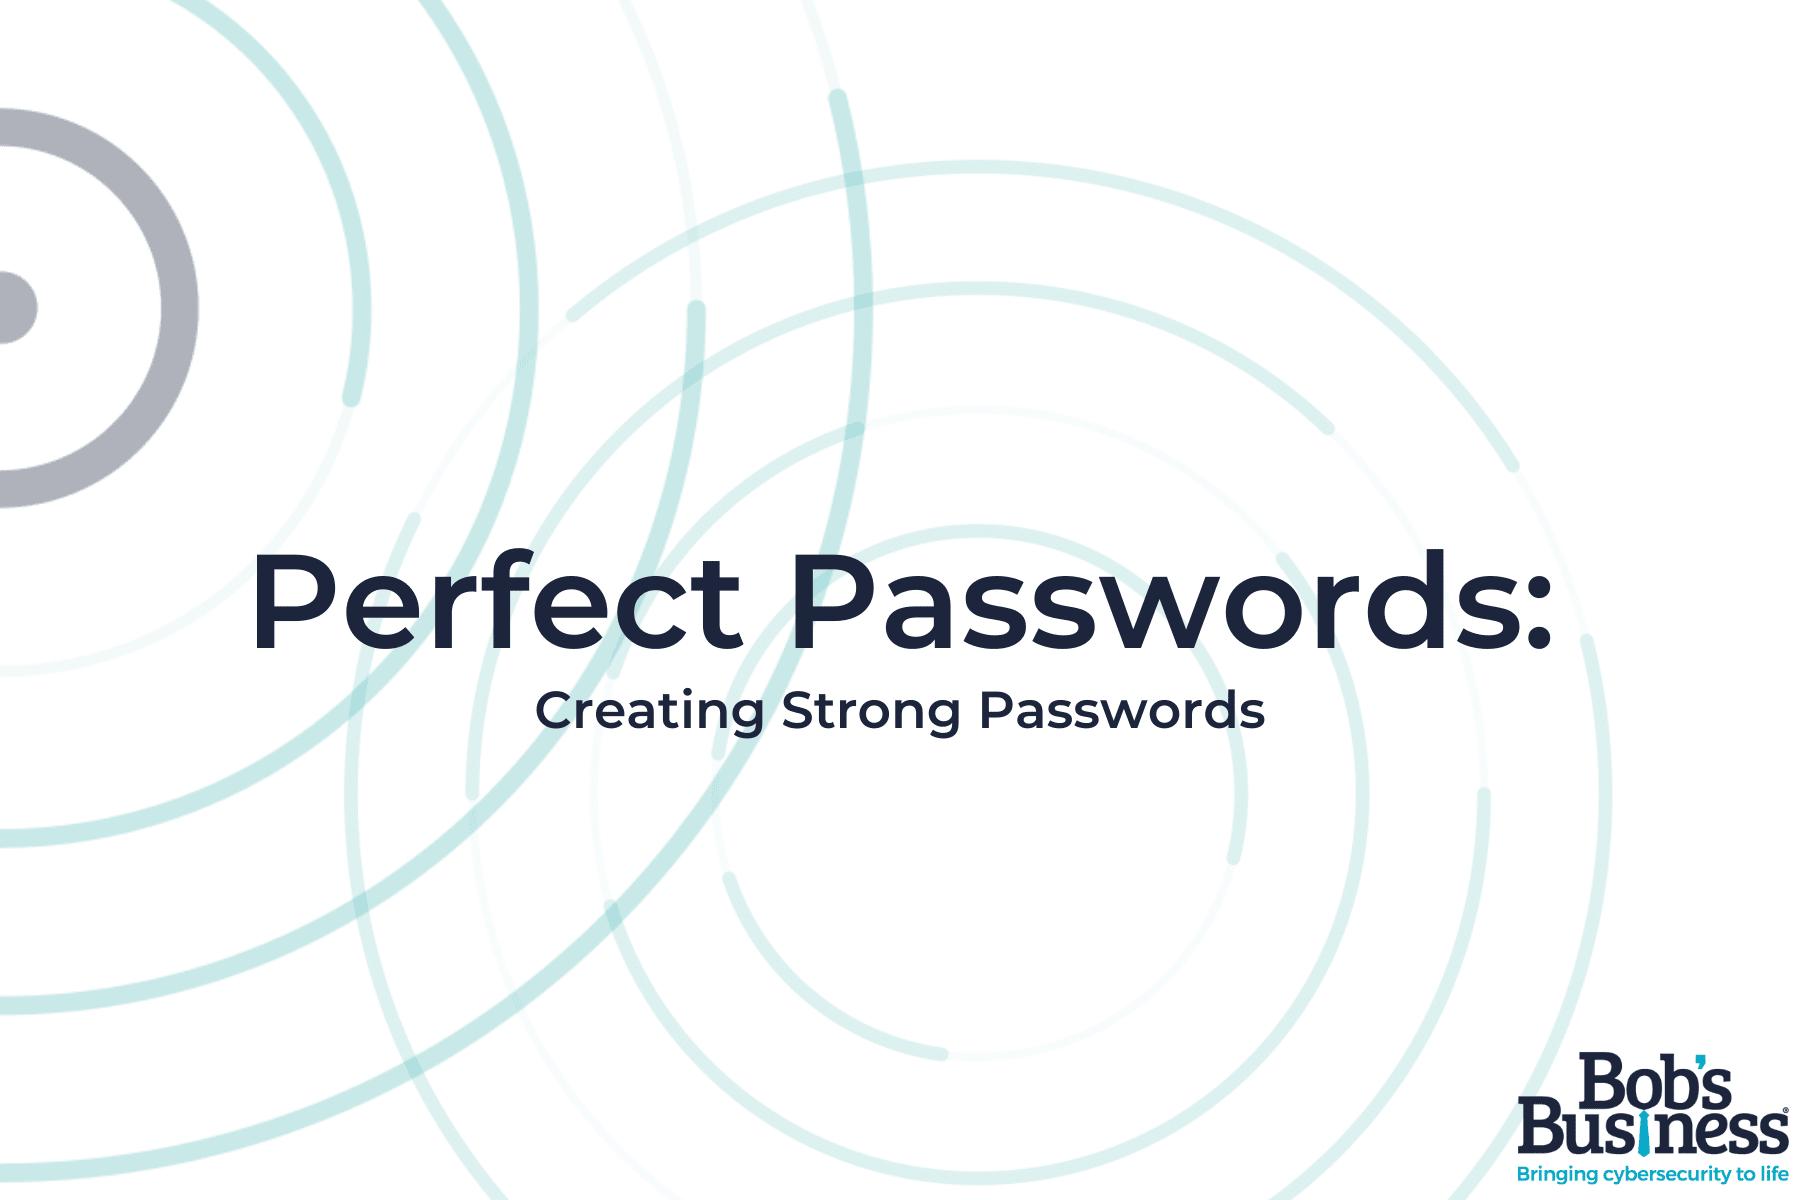 Creating password course